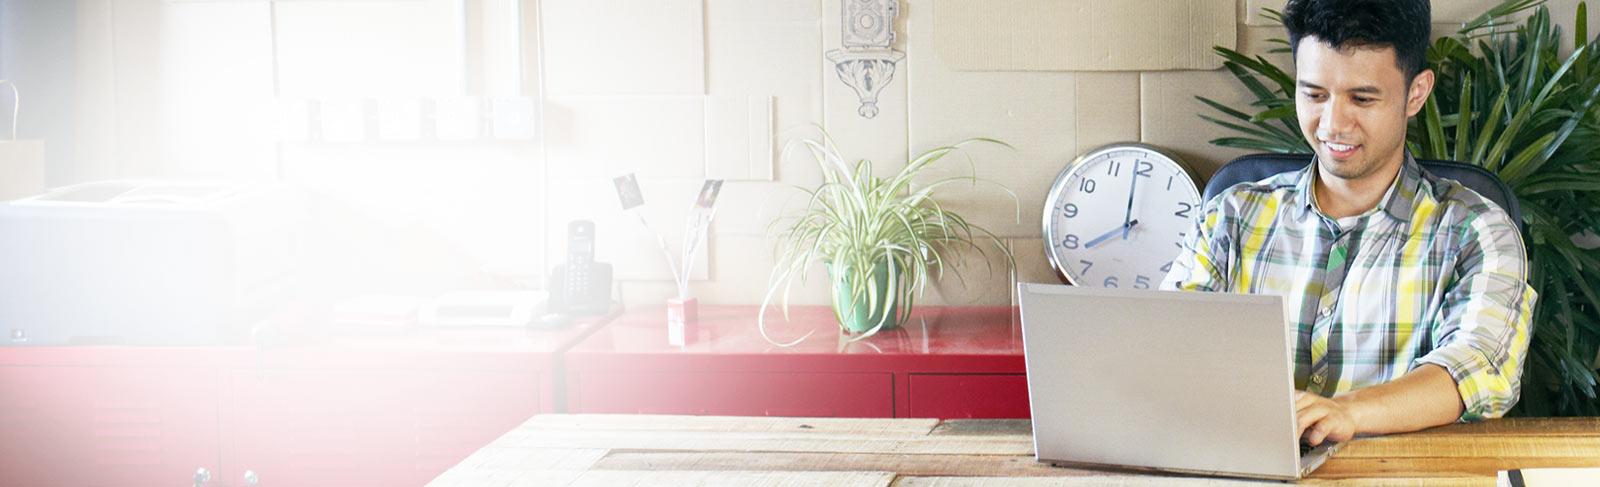 Tìm hiểu về Microsoft Office Home & Business 2013